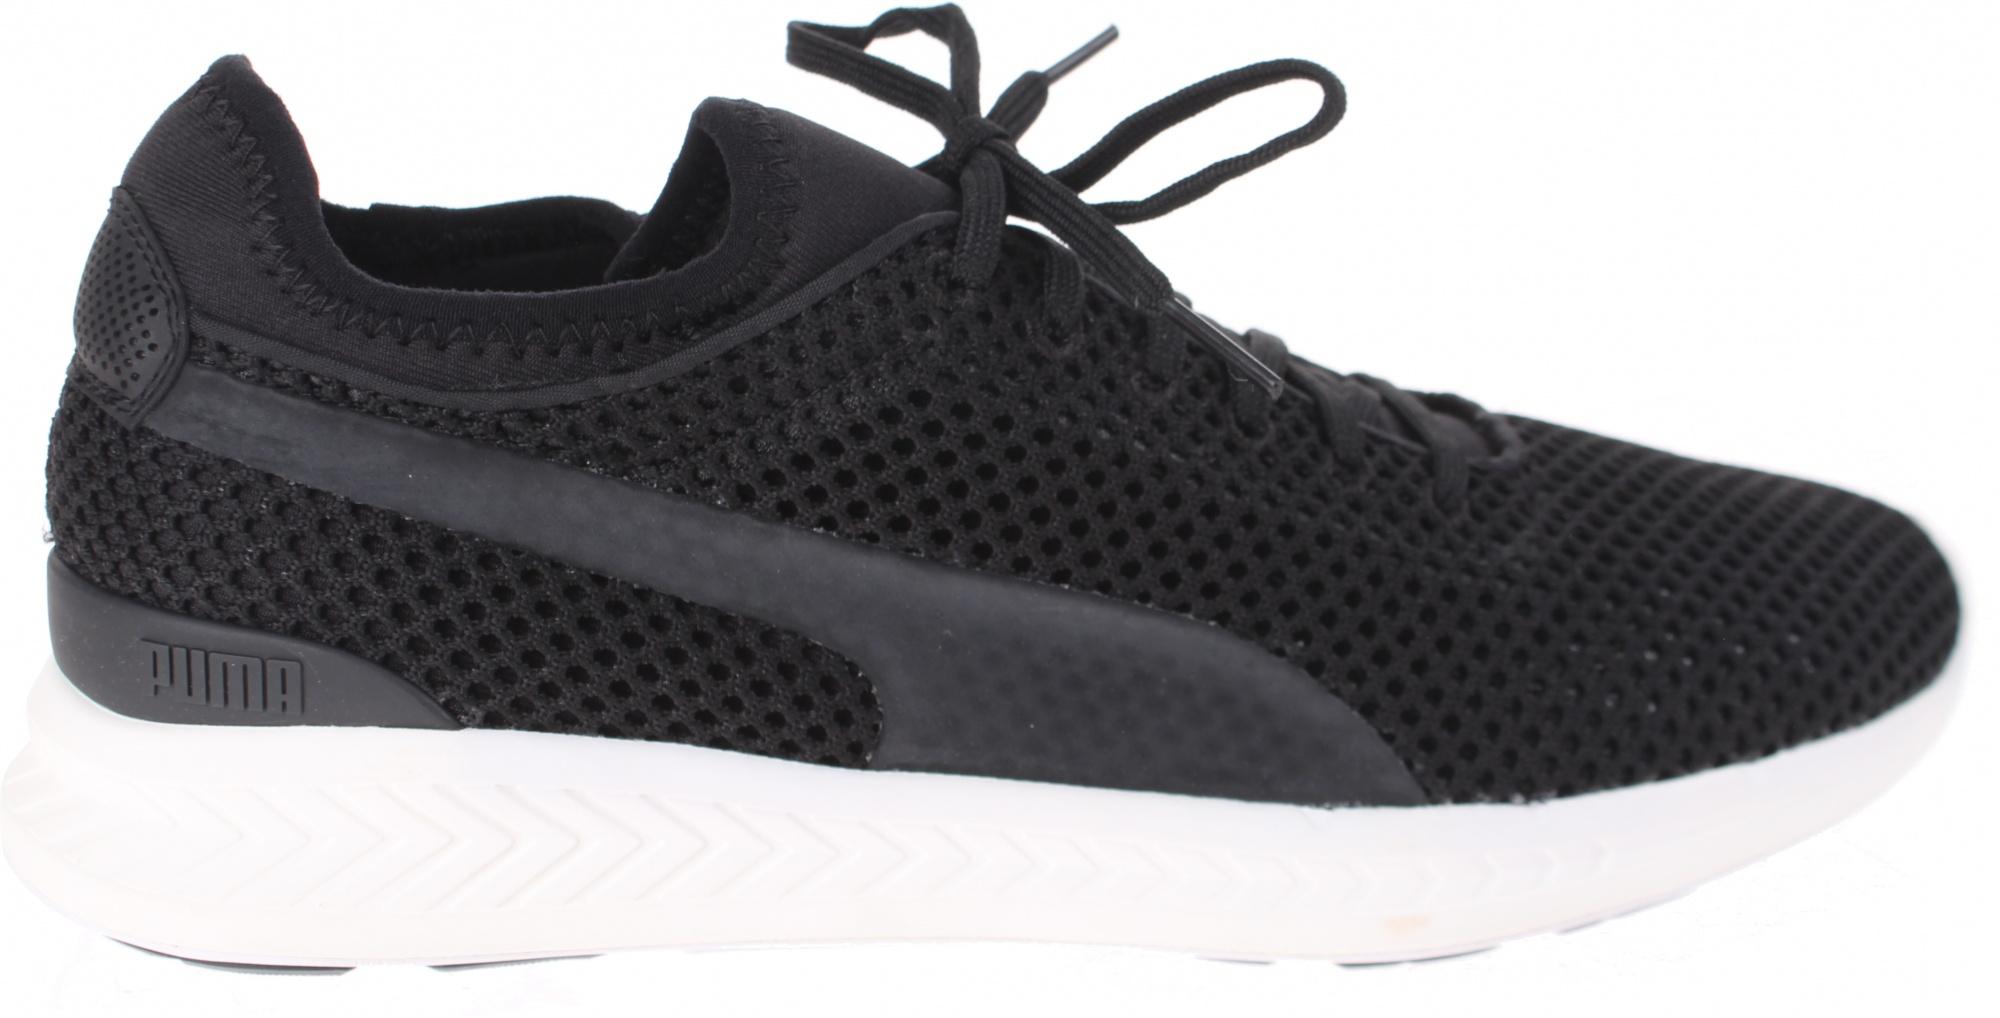 6f25e749b22d Puma Sneakers Ignite Sock Knit Men Black - Internet-Sport Casuals